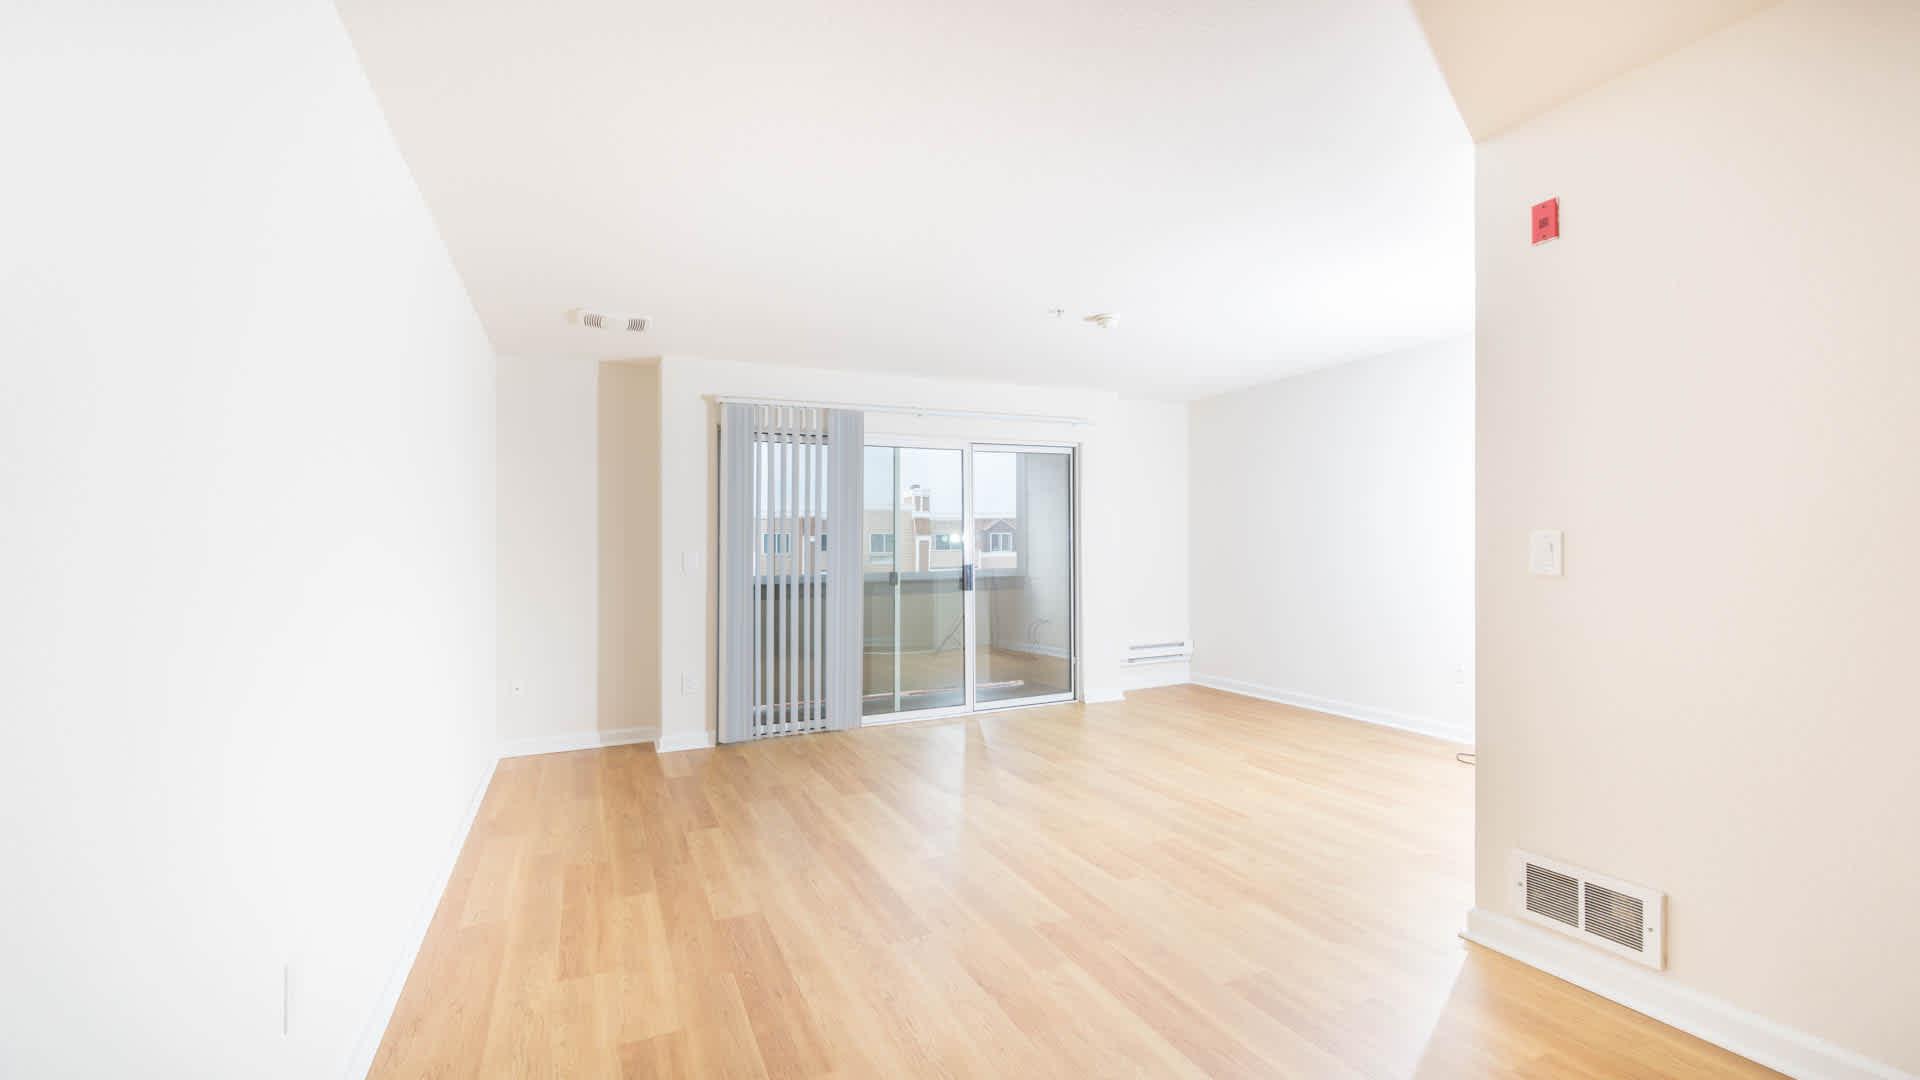 artistry-emeryville-apartm7ents-living-area.jpg